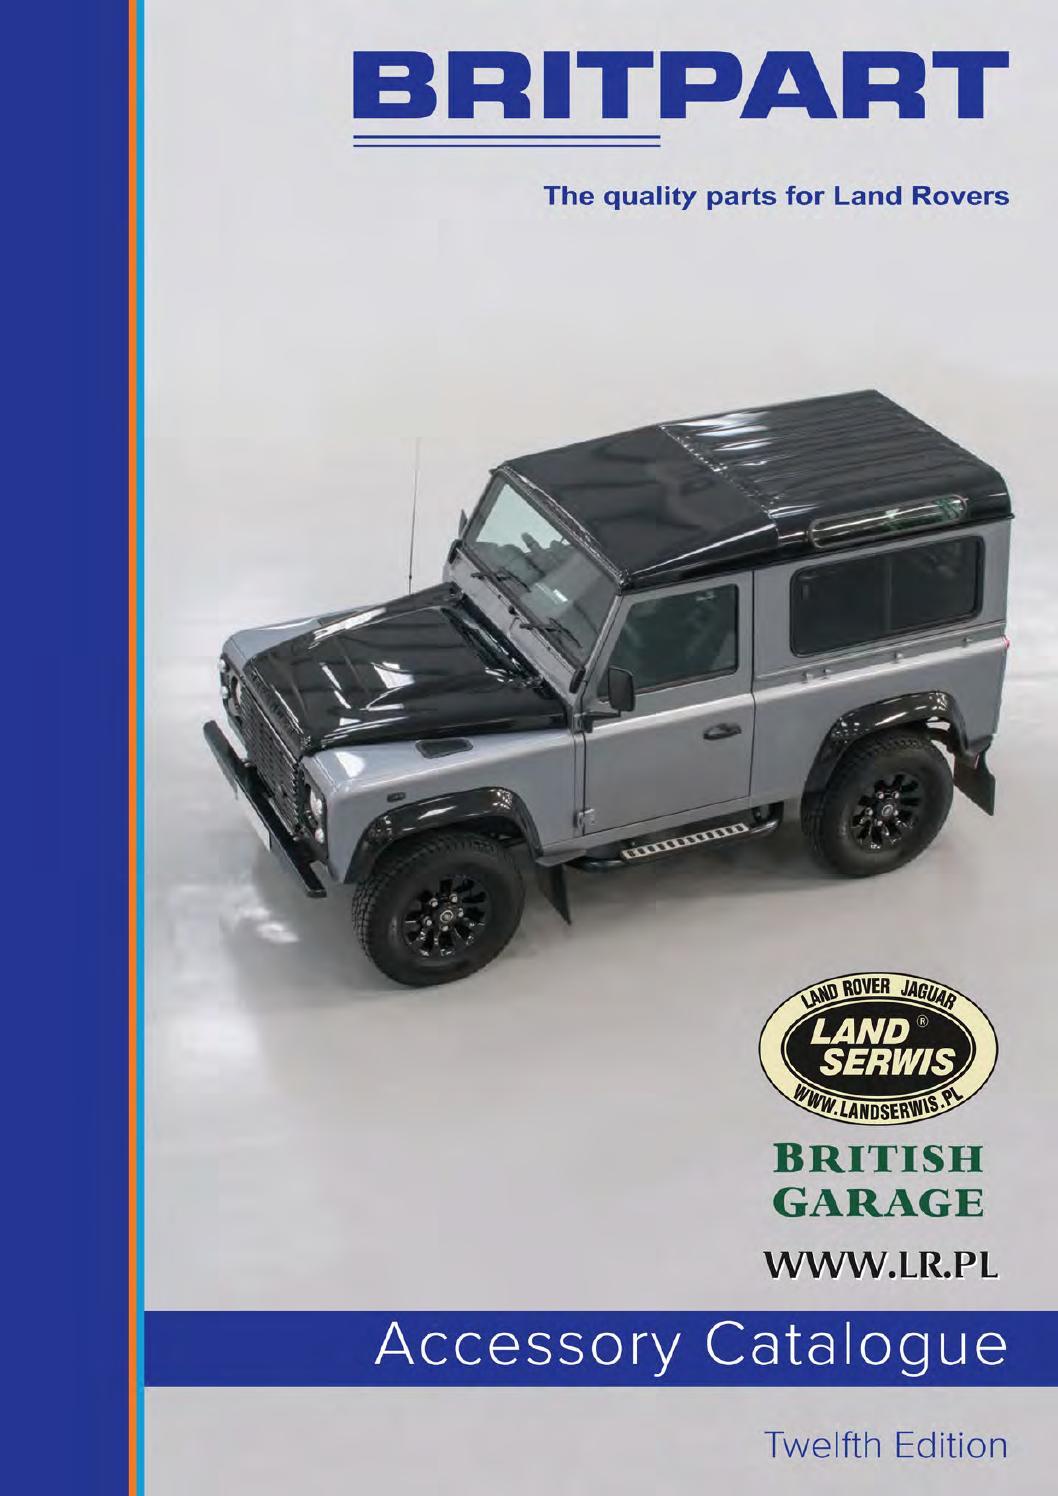 hight resolution of britpart 12 2016 katalog akcesori w land rover range rover lrpl mini by land serwis issuu